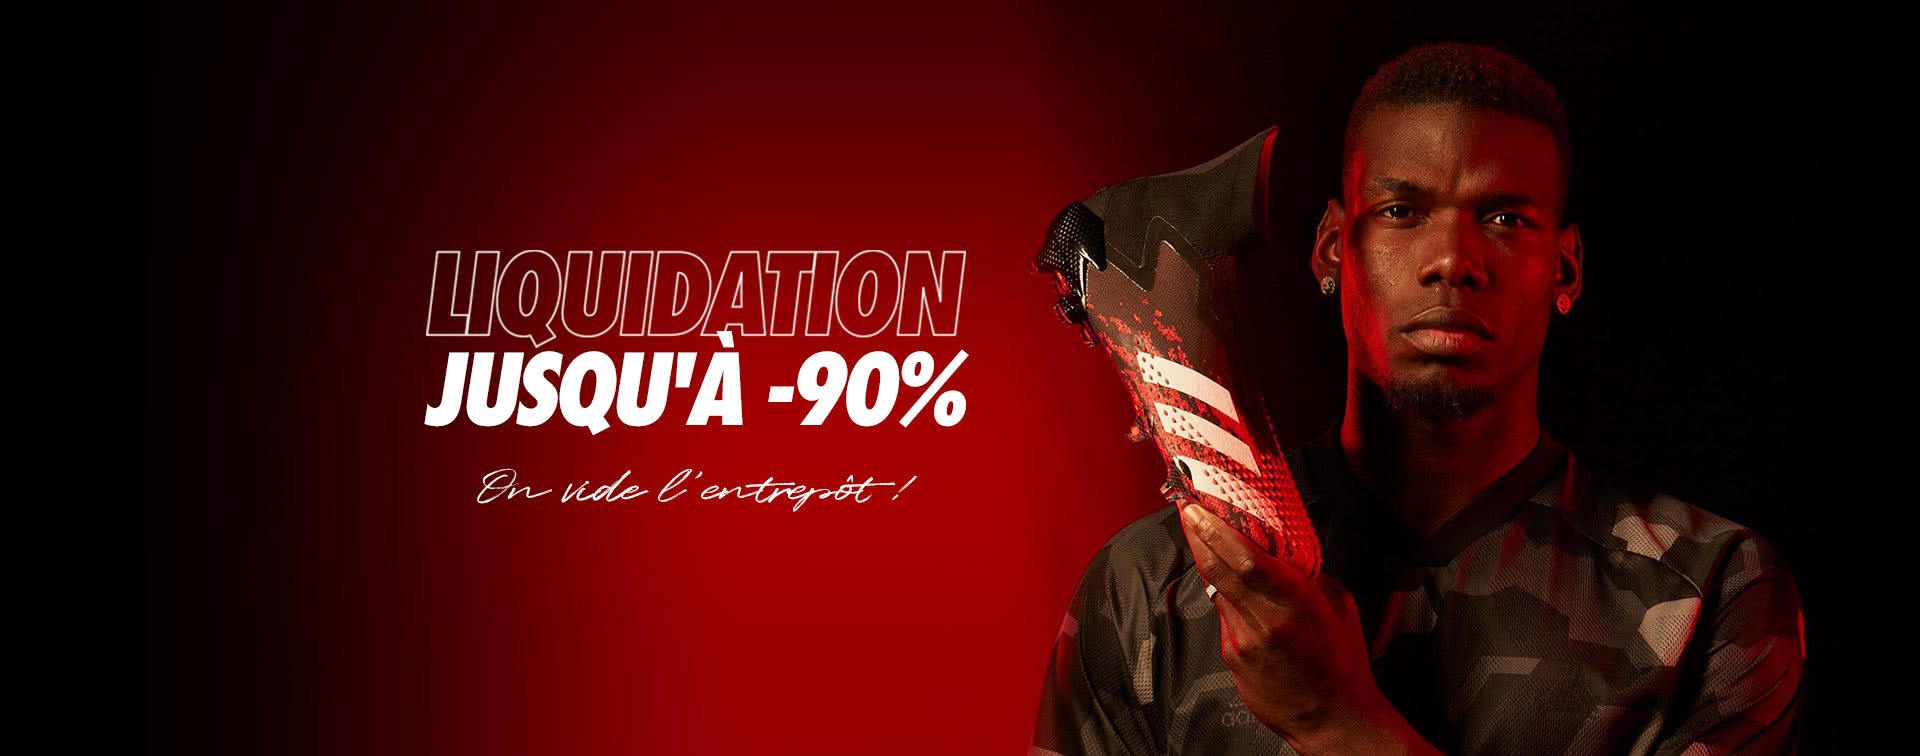 Liquidation jusqu'à -90%